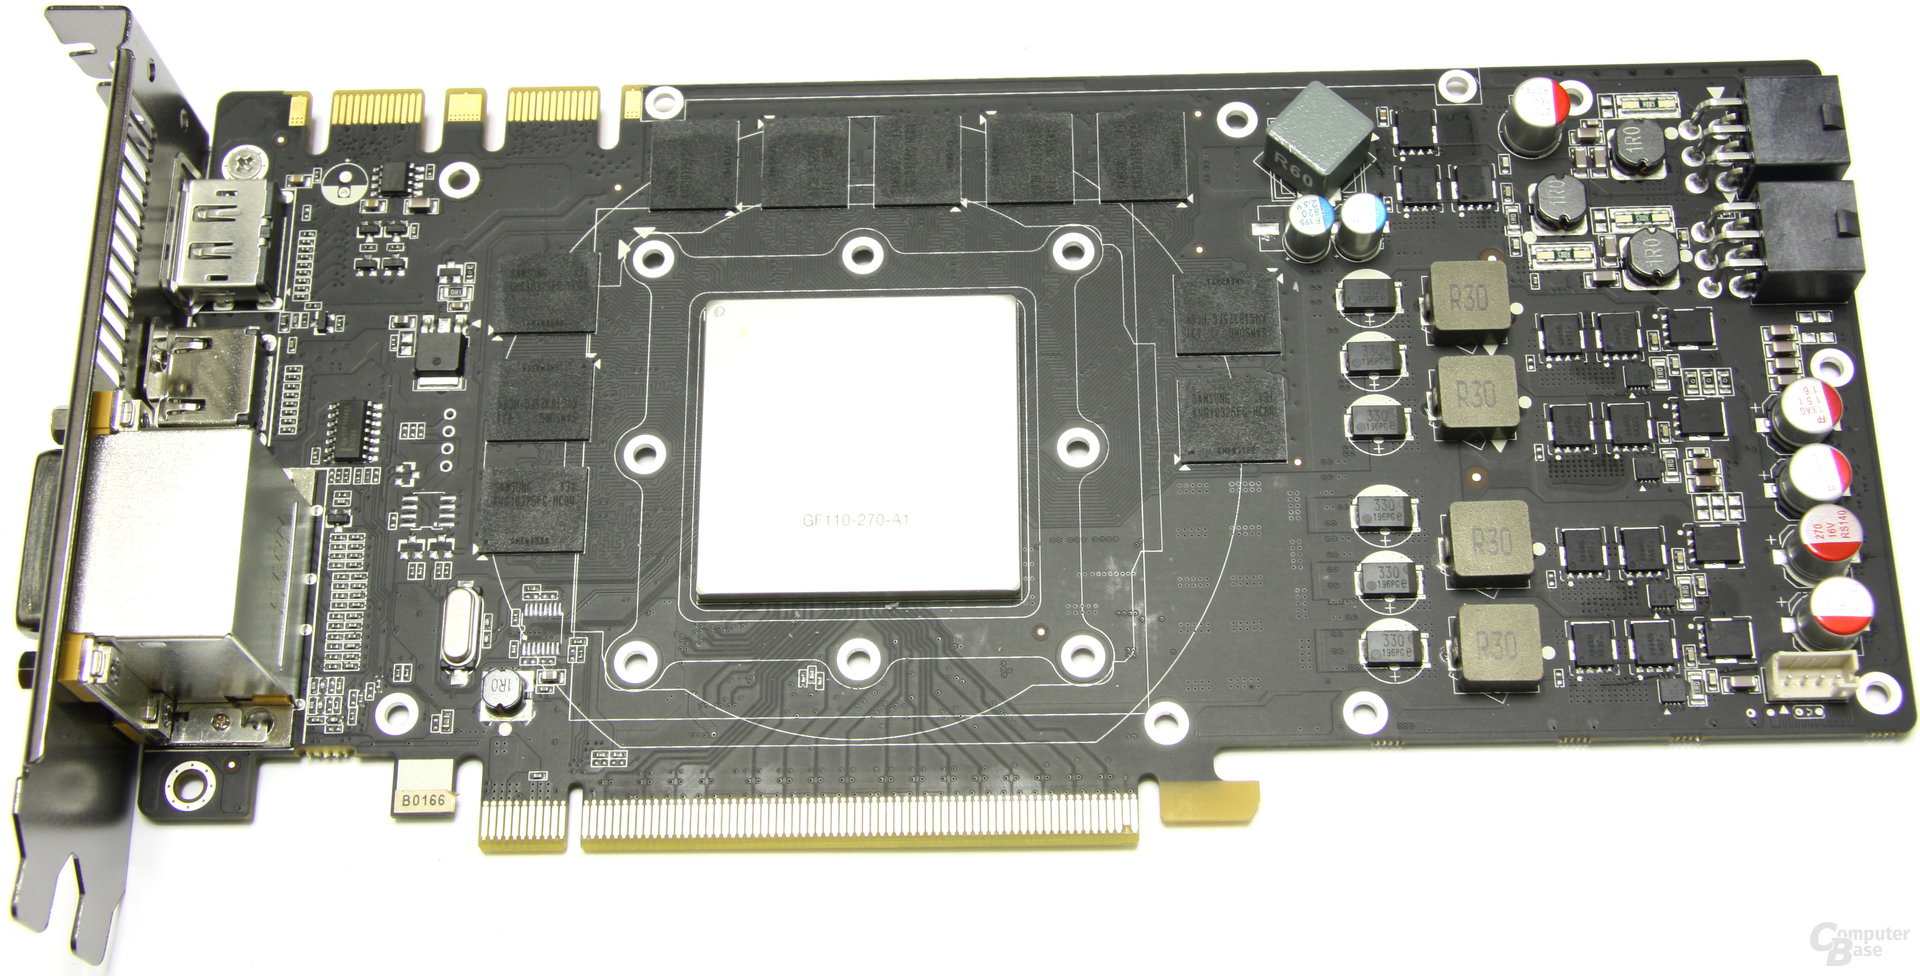 GeForce GTX 560 Ti 448 Core LE ohne Kühler